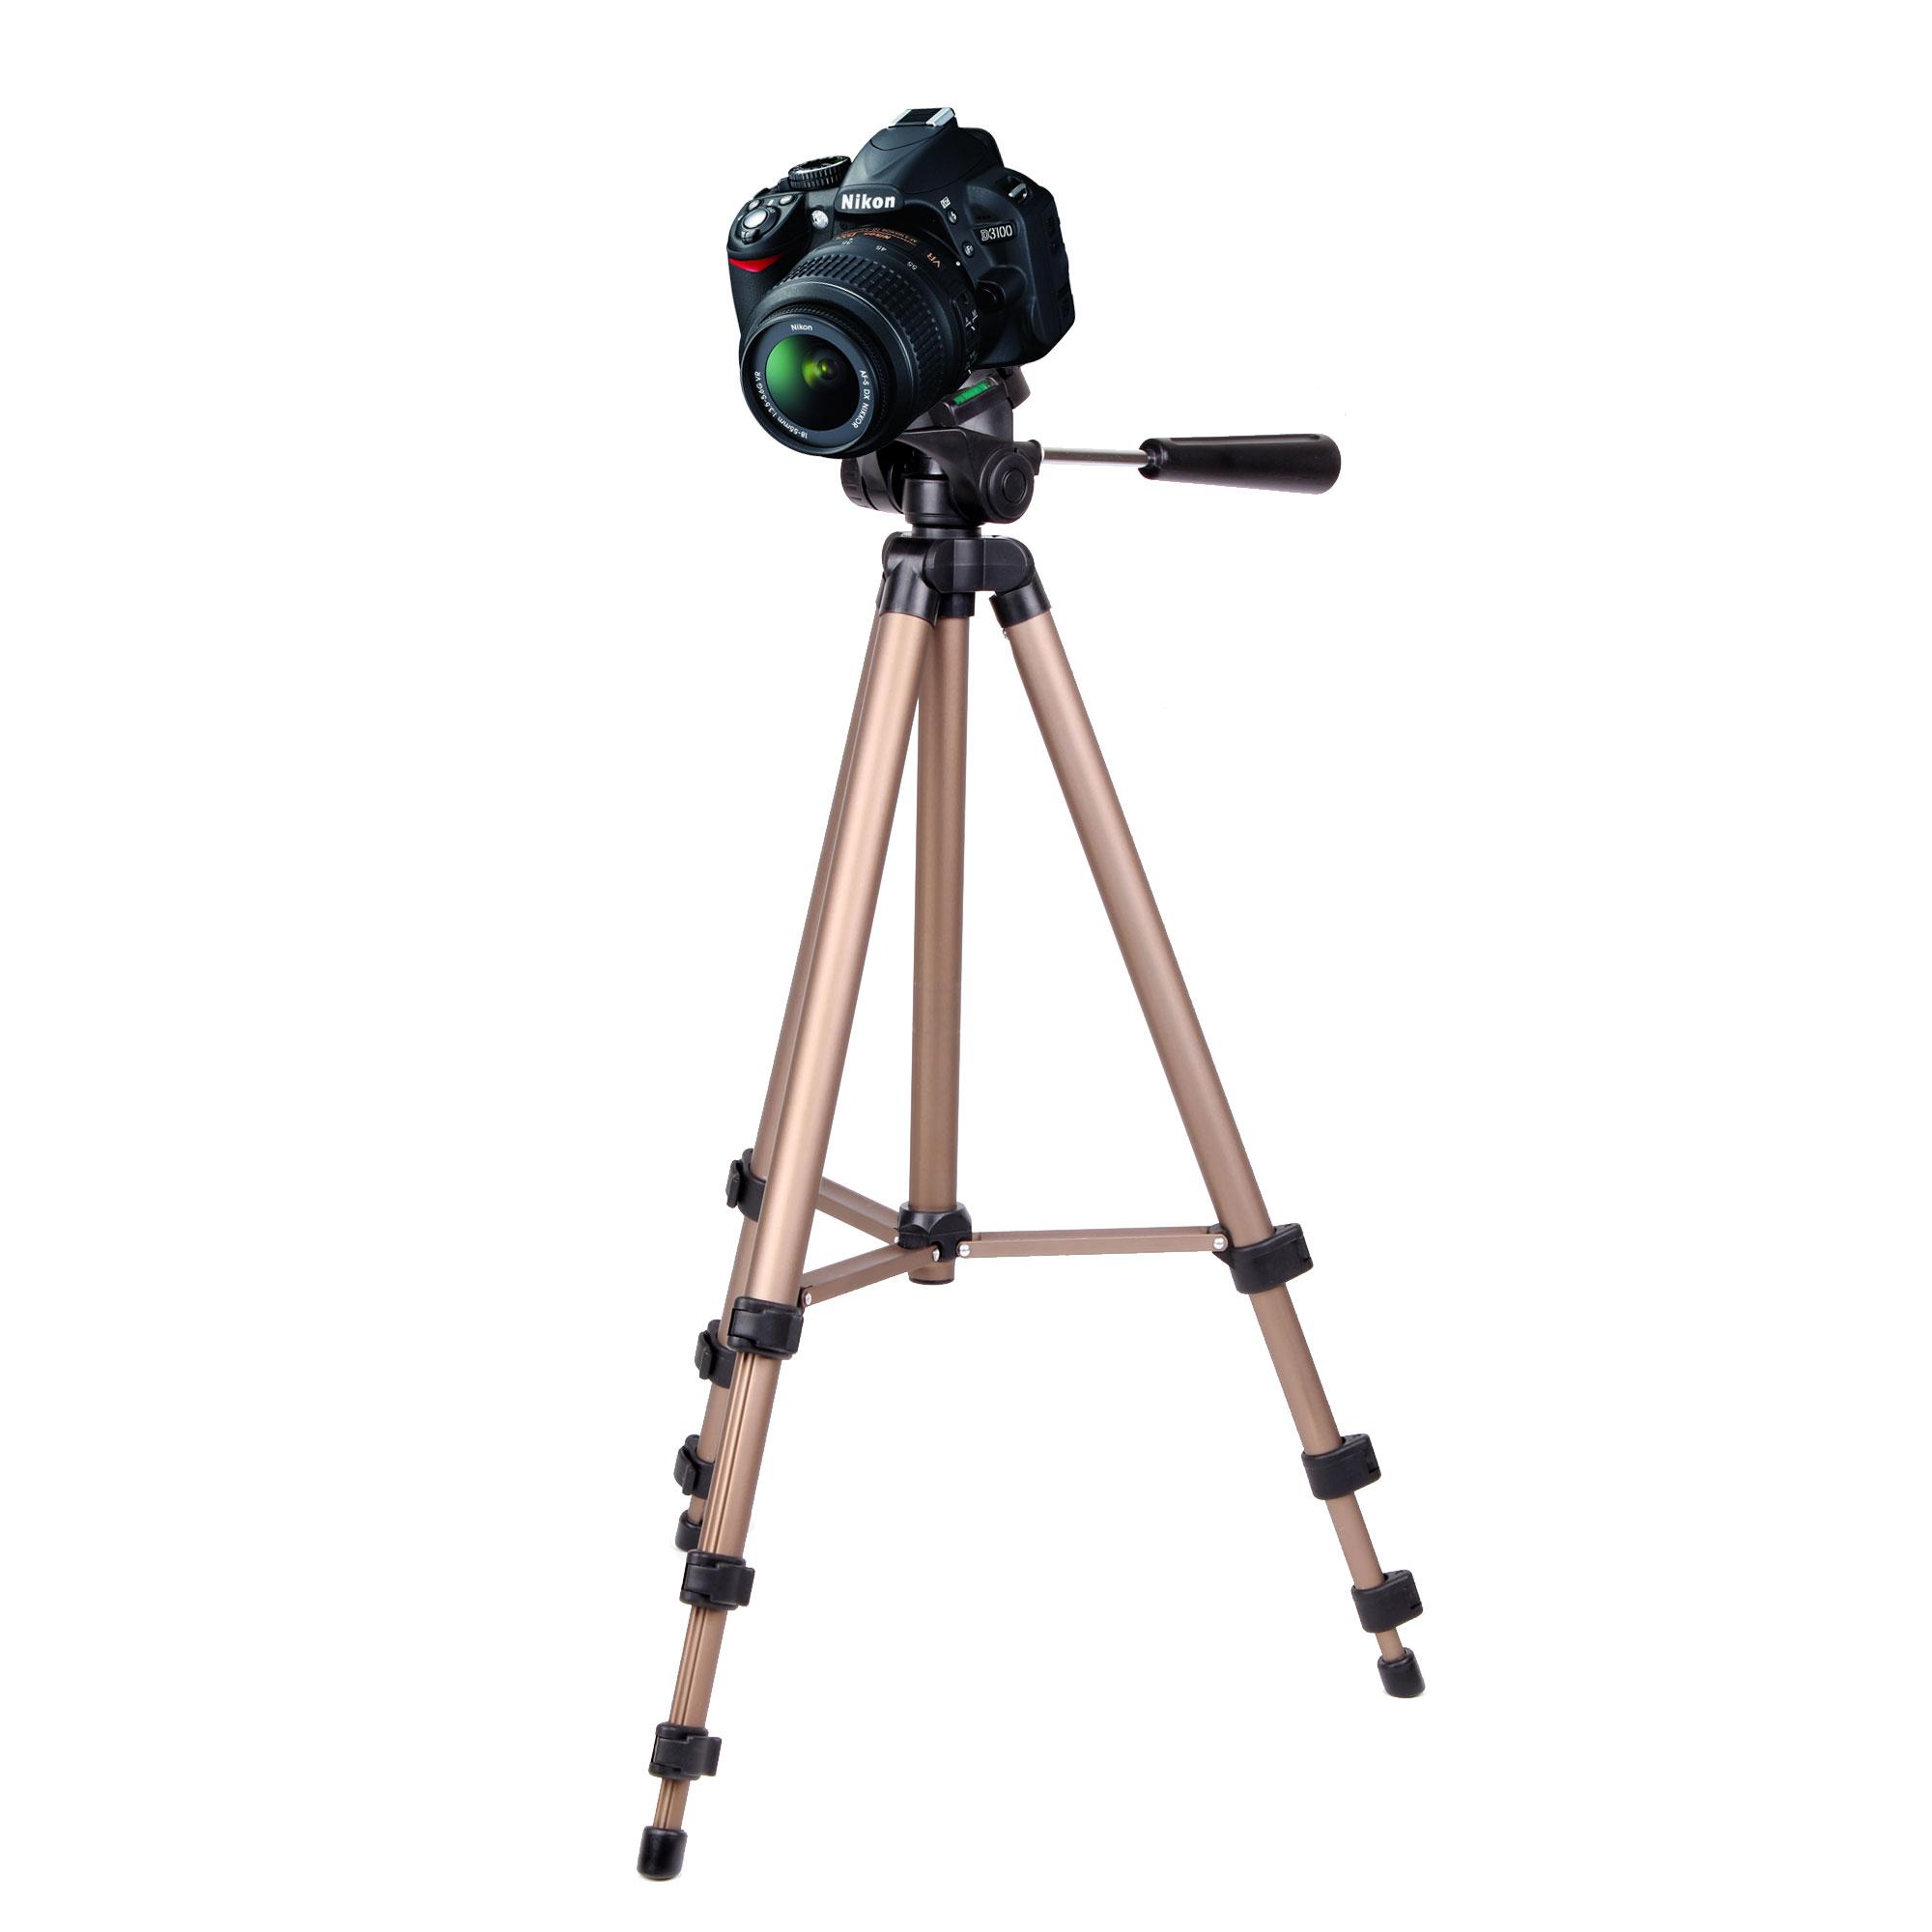 Fully Adjustable Portable Camera Tripod Suits Nikon D7000 ...